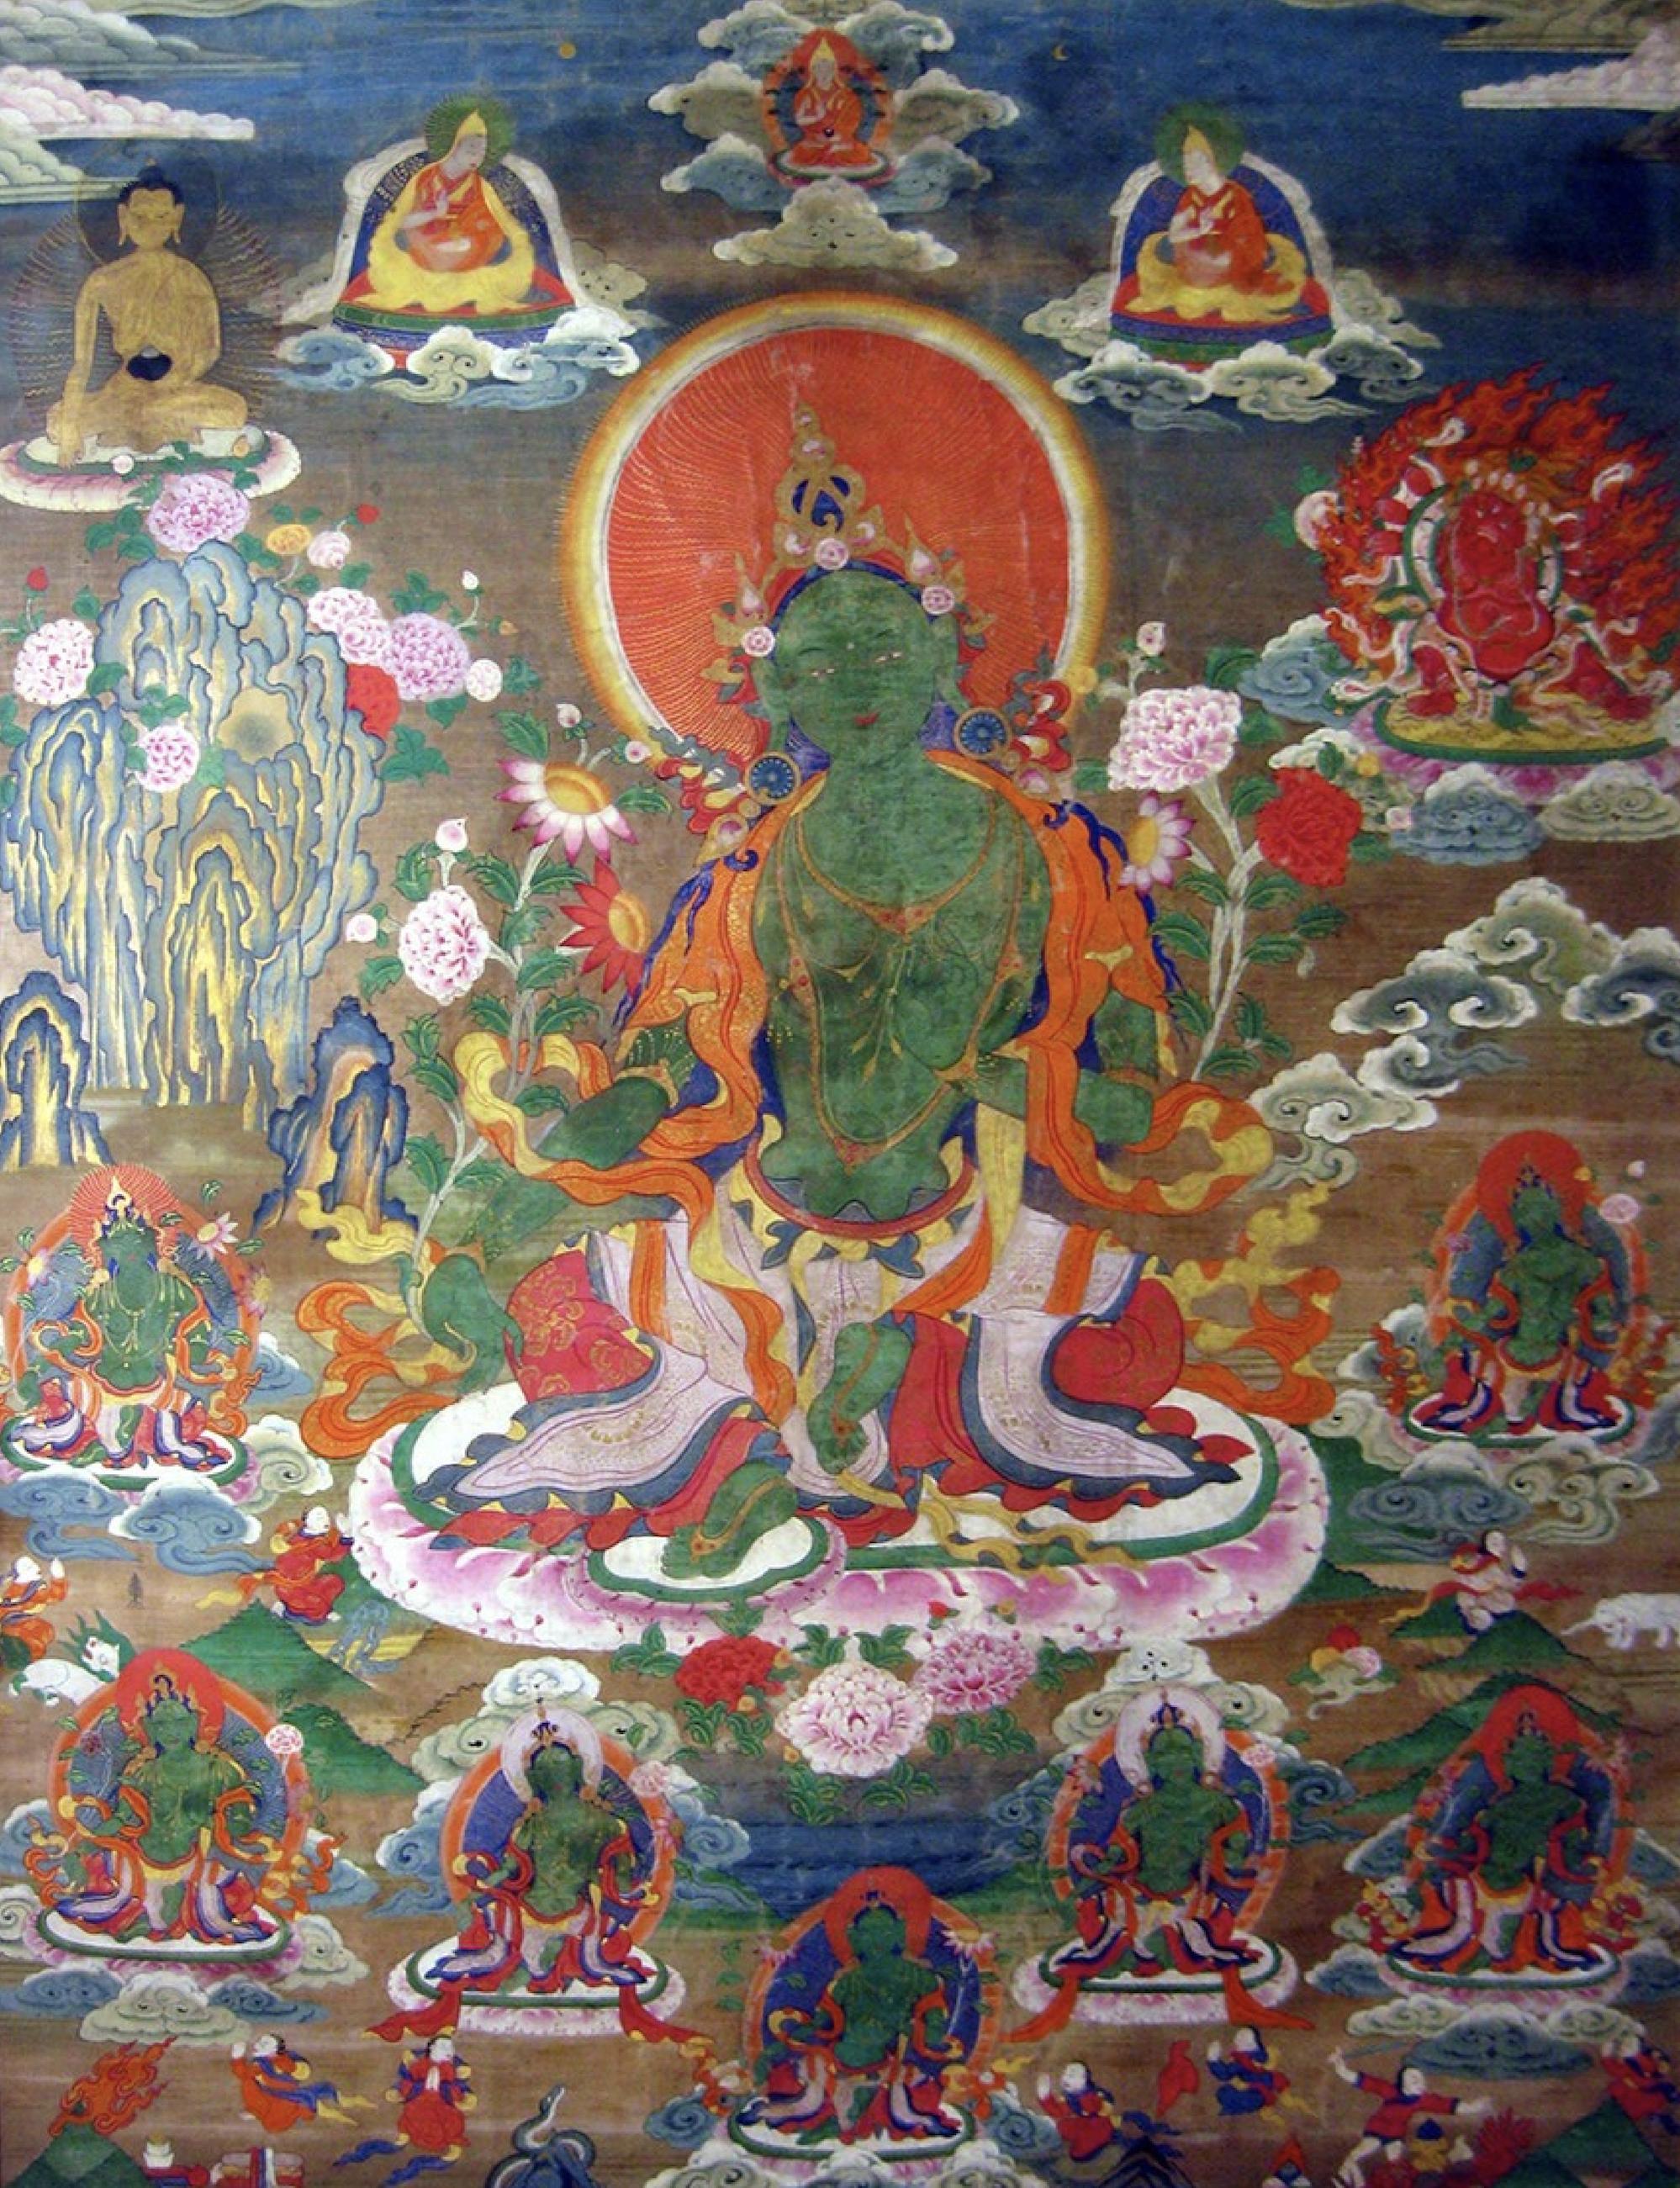 Old Tangkha of Green Tara with Hayagriva lineage gurus Shakyamuni Buddha